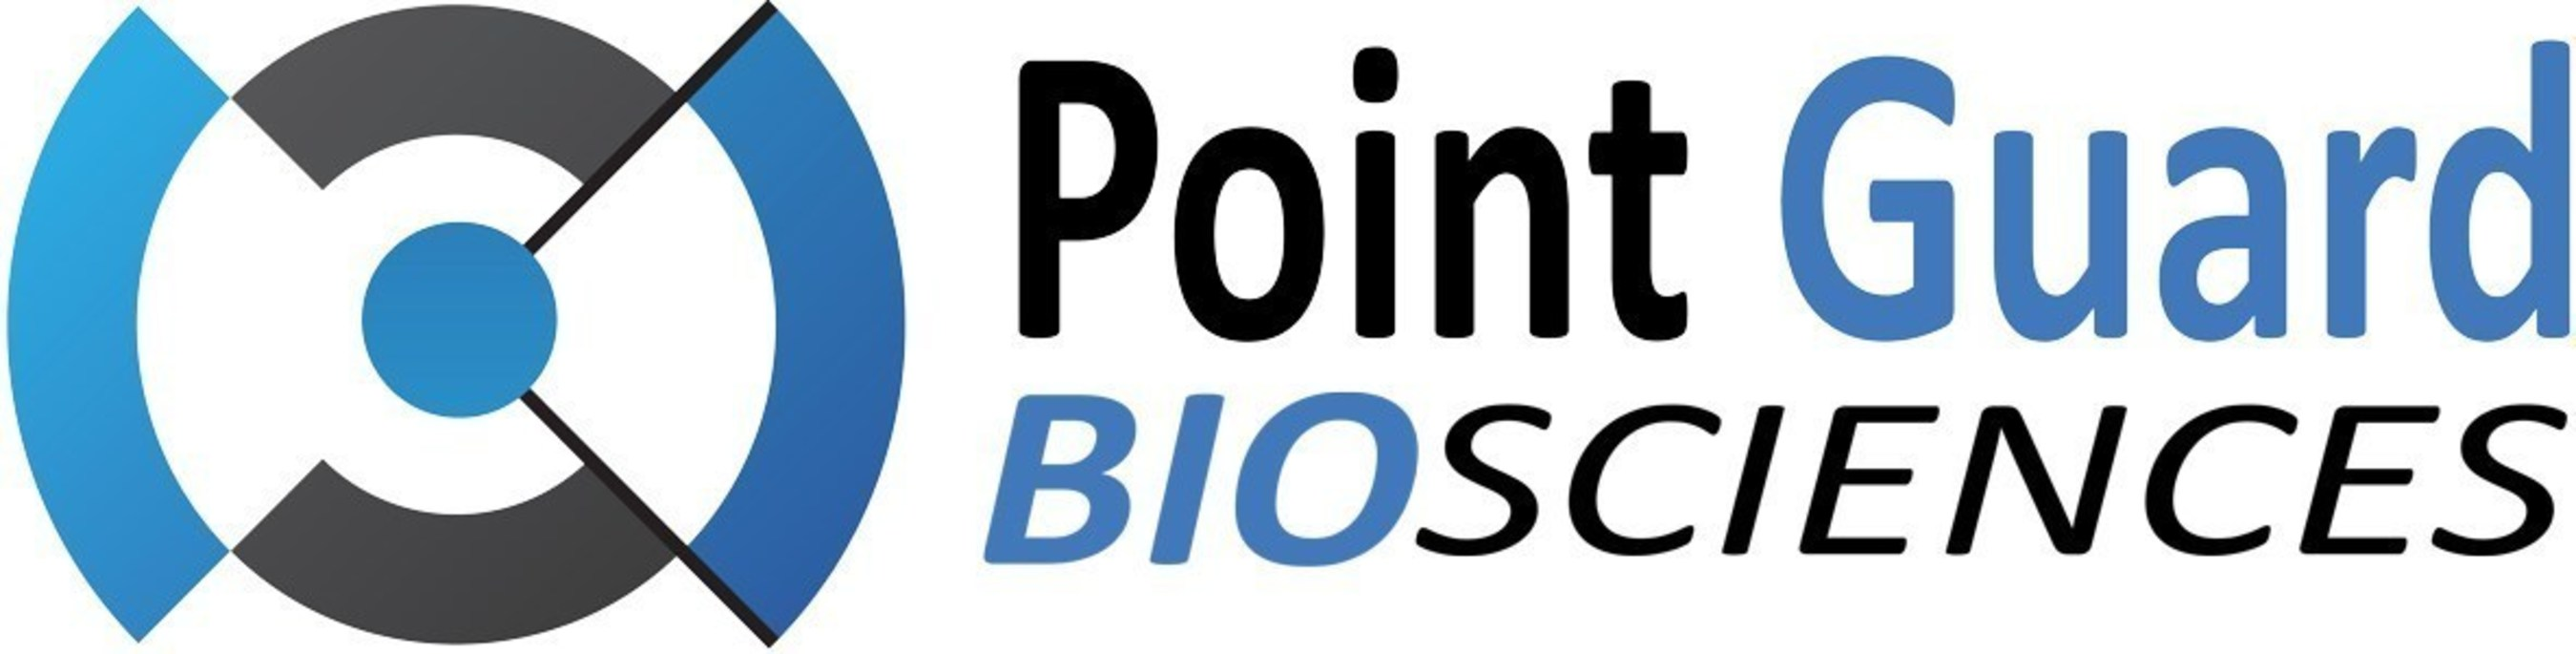 Point Guard Biosciences, LLC logo